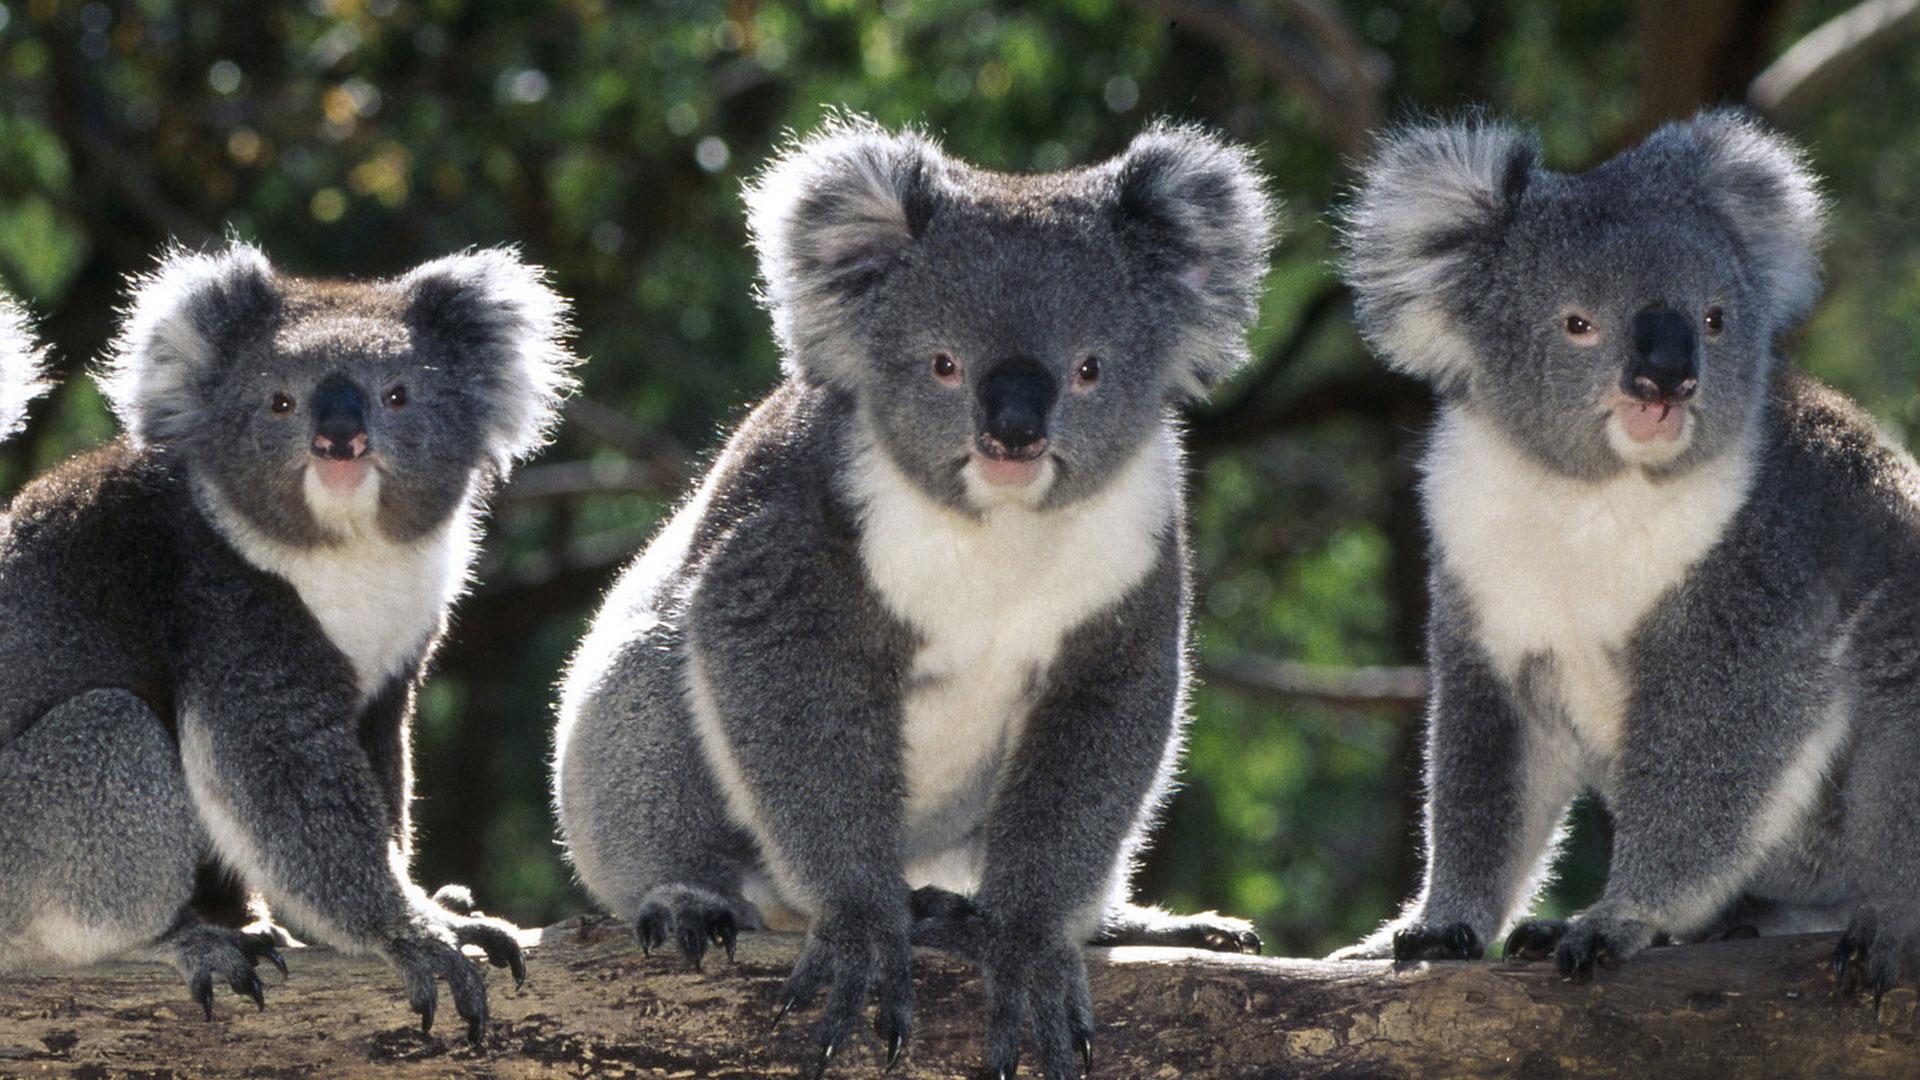 Three koalas in a tree.